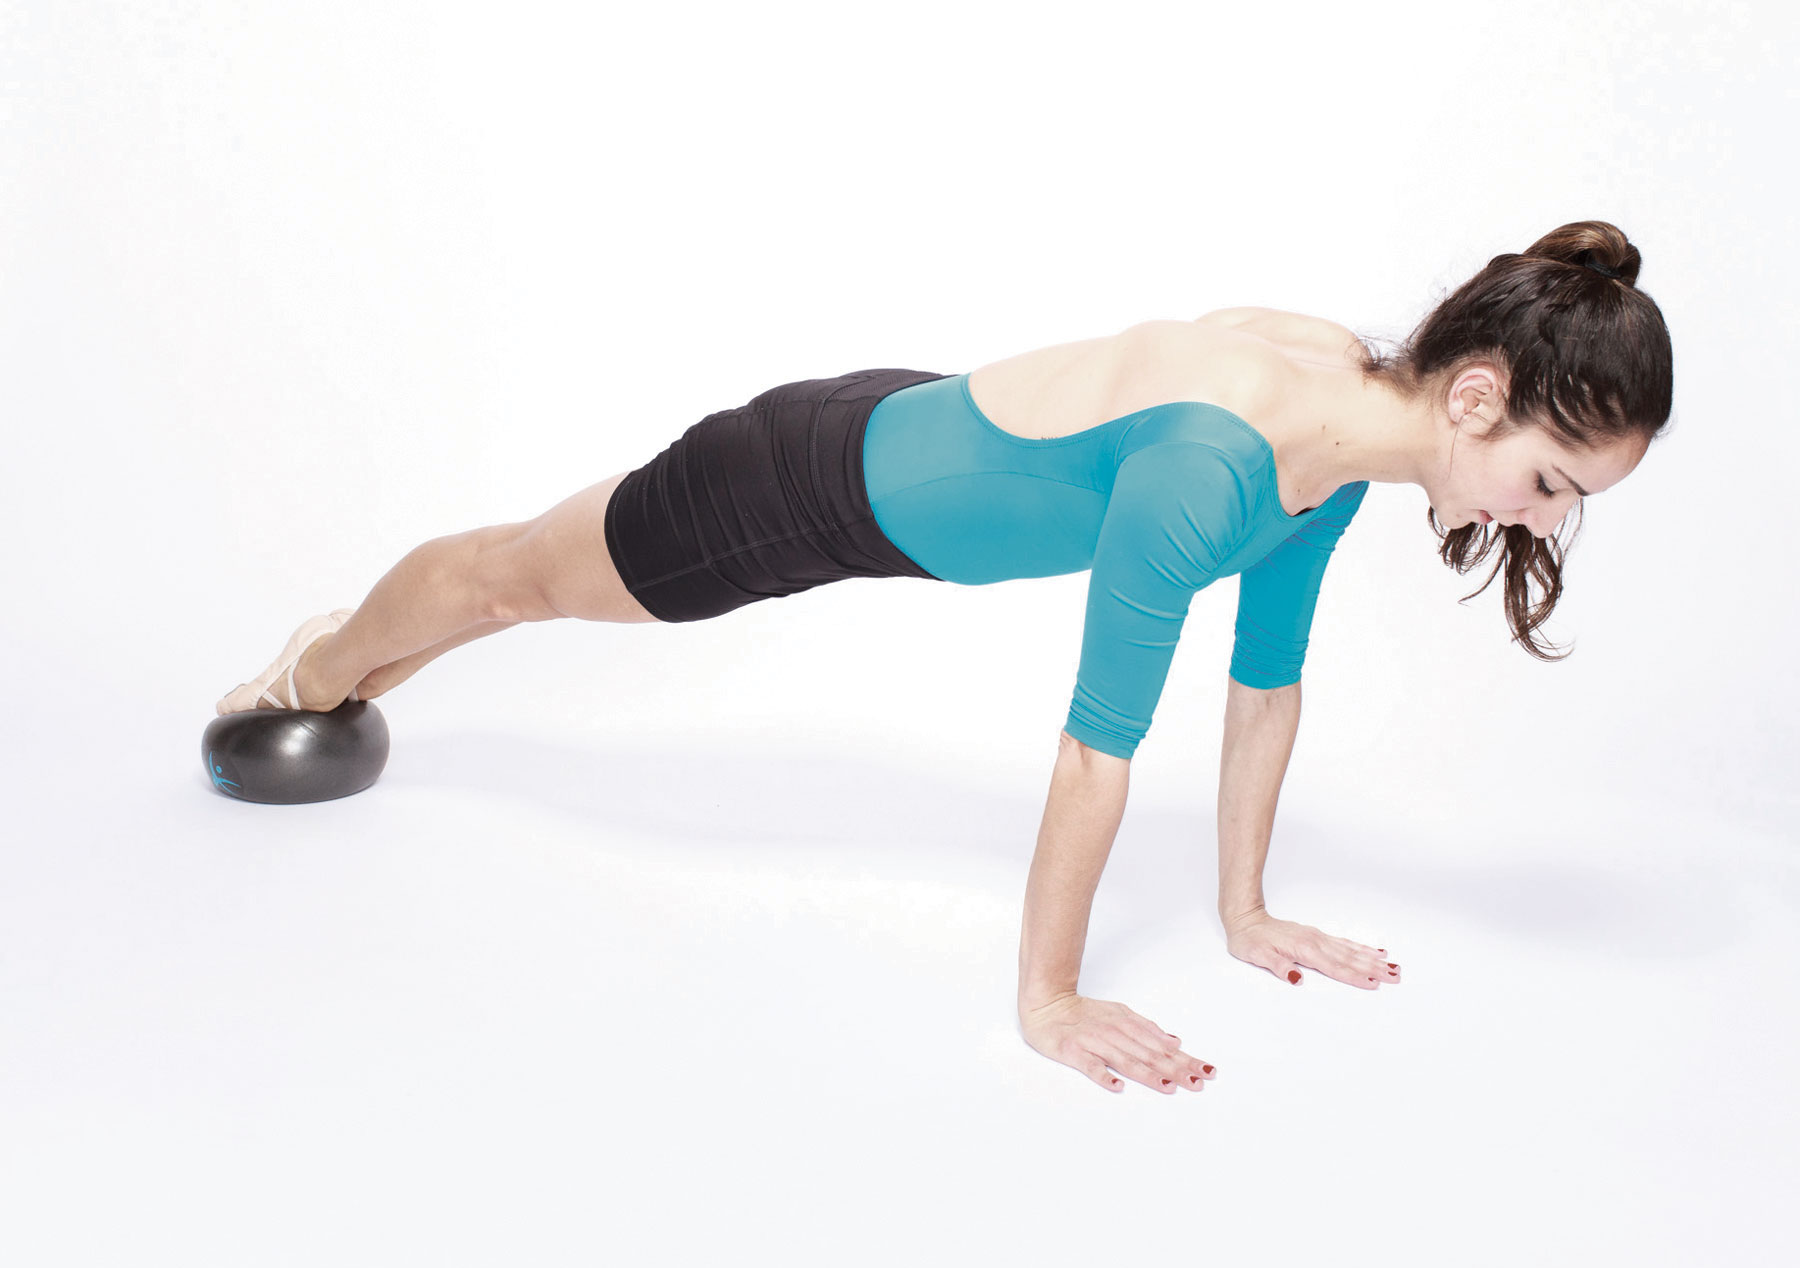 flx ball plank